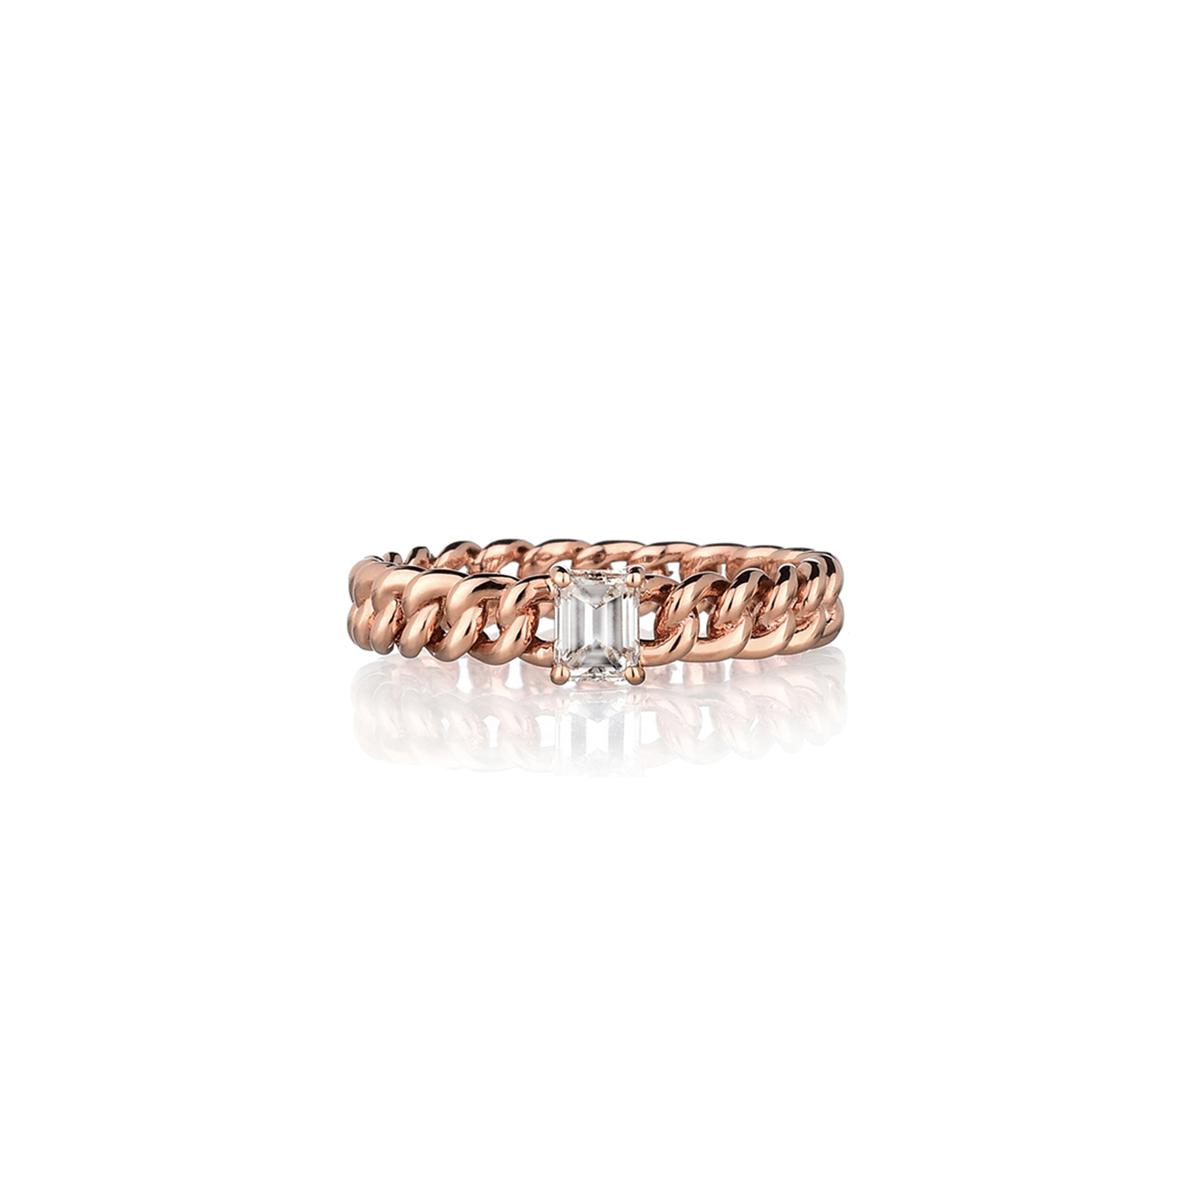 Minigroumette - Fancy emerald Ring